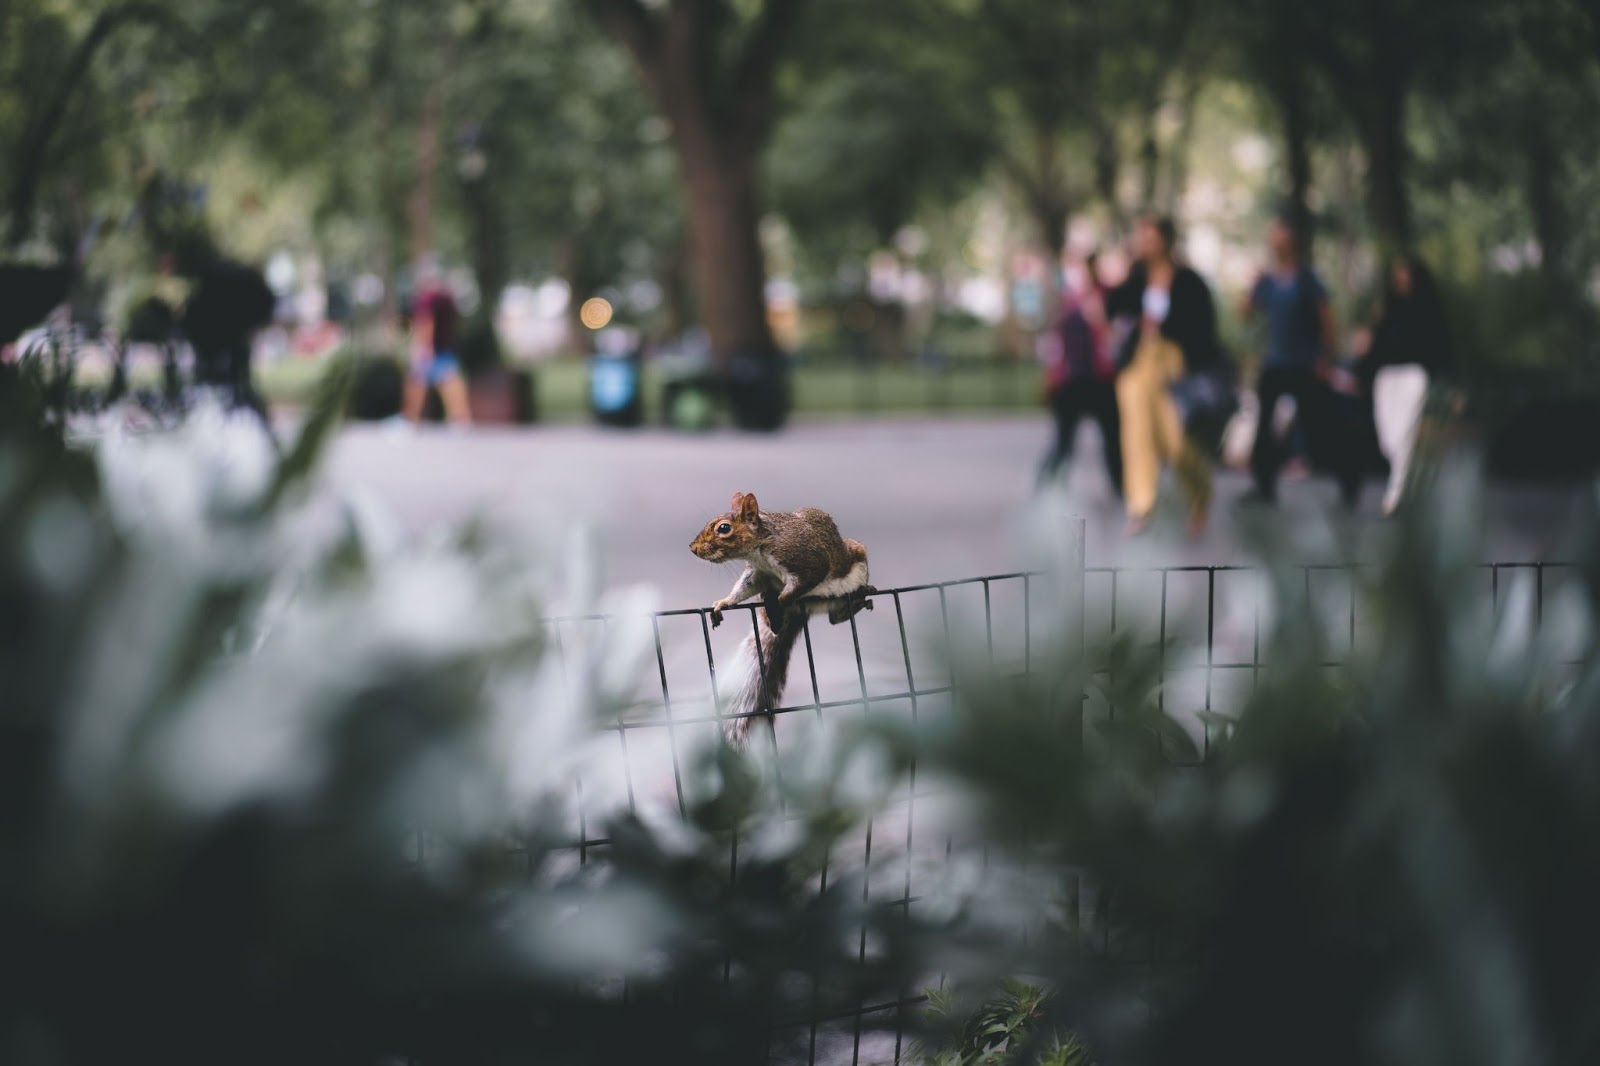 Parks and natural environment